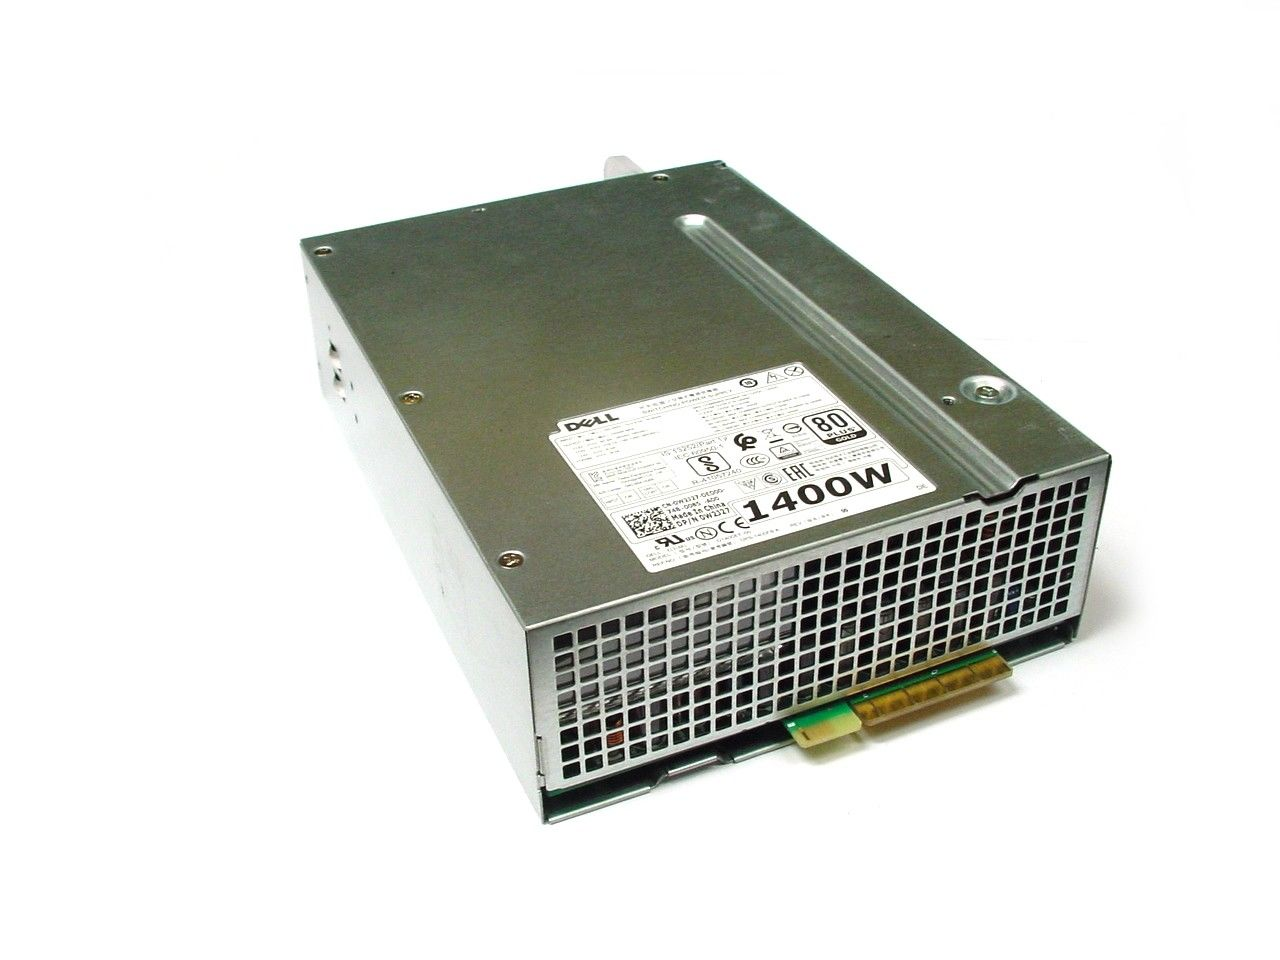 DELL Precision T7920 Netzteil Power Supply PSU 1400W 2CTMC